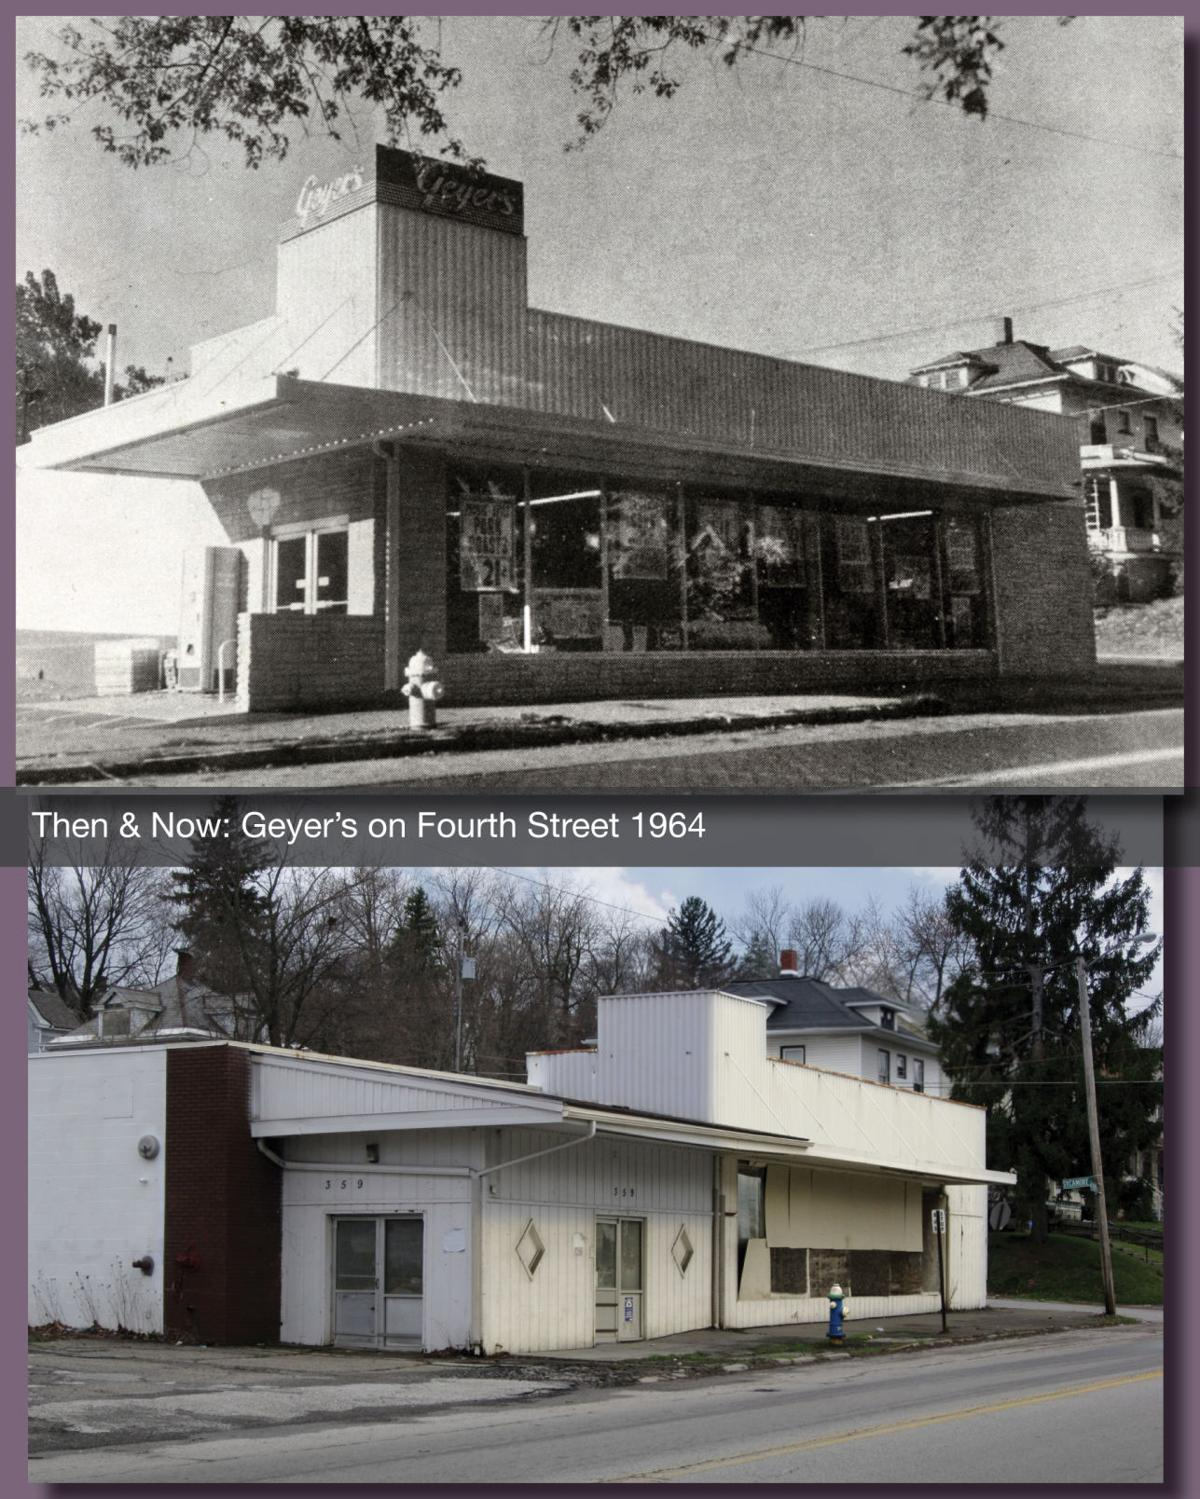 Then & Now Geyer's